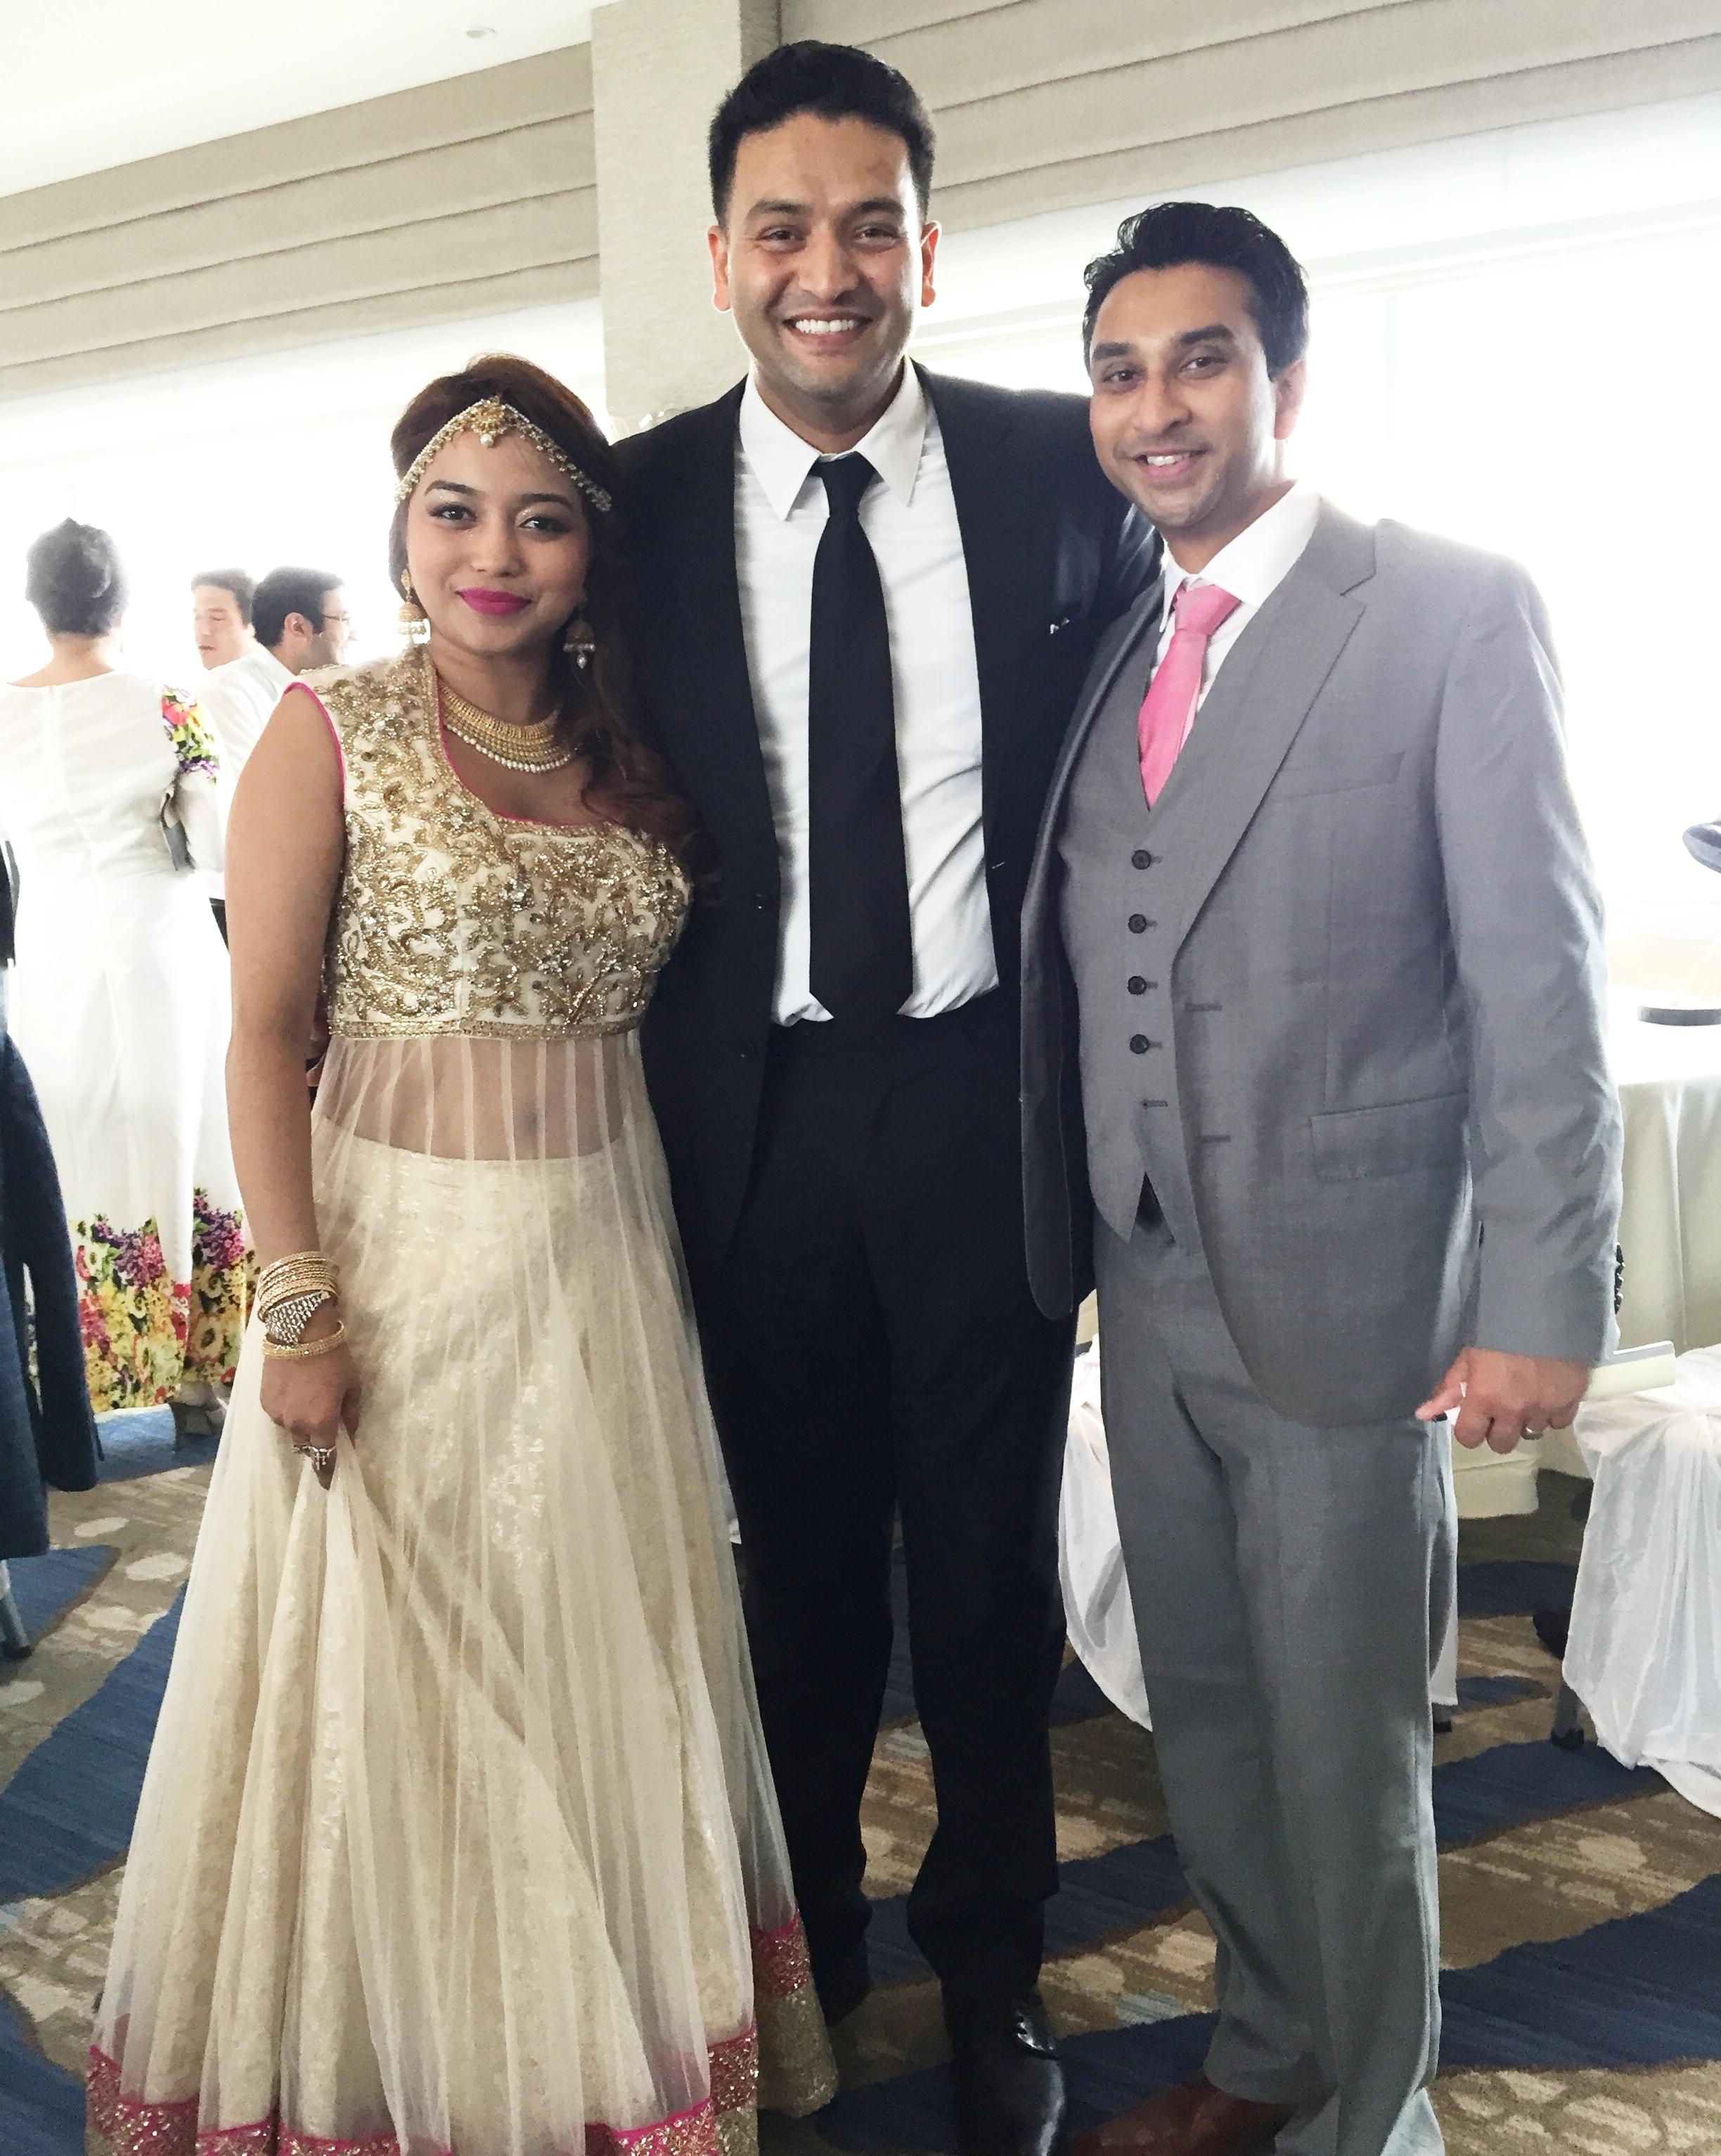 Dj Amrit with the couple at JErsey city hyatt, NJ.